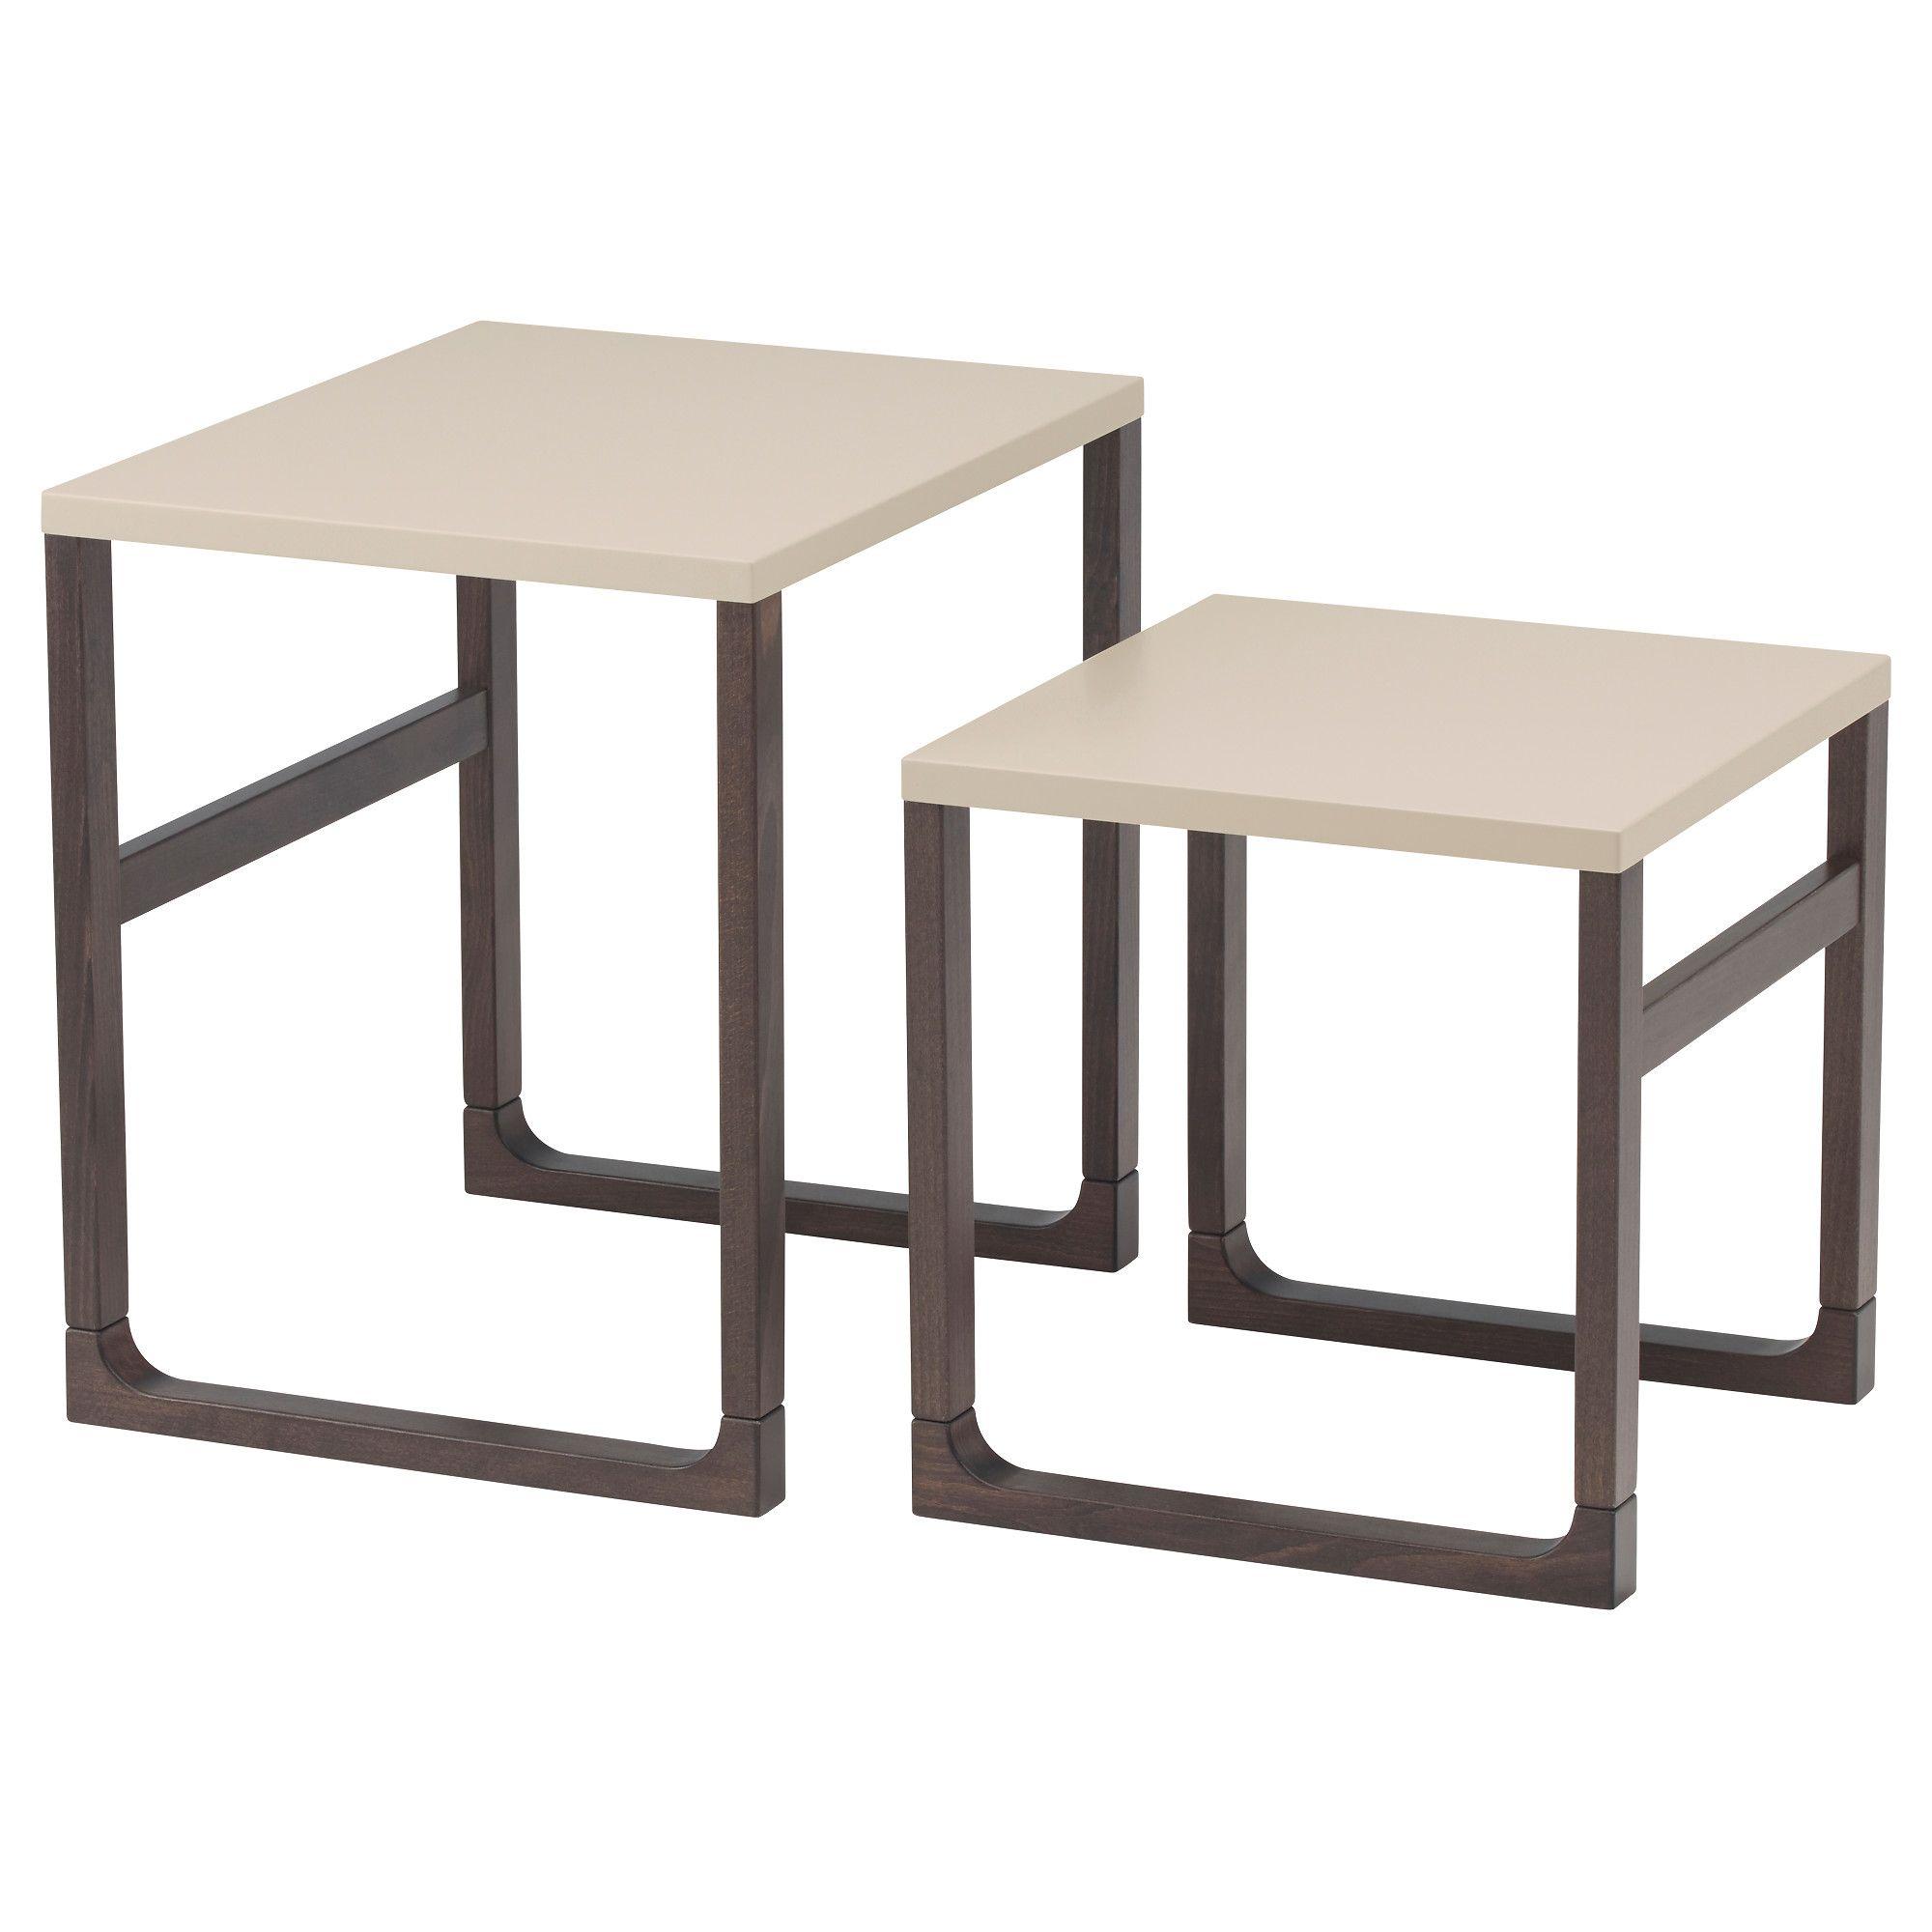 Rissna Trapezia Zigkon Set 2 Tem Ikea Nesting Tables Ikea Coffee Table Ikea Nesting Tables [ 2000 x 2000 Pixel ]